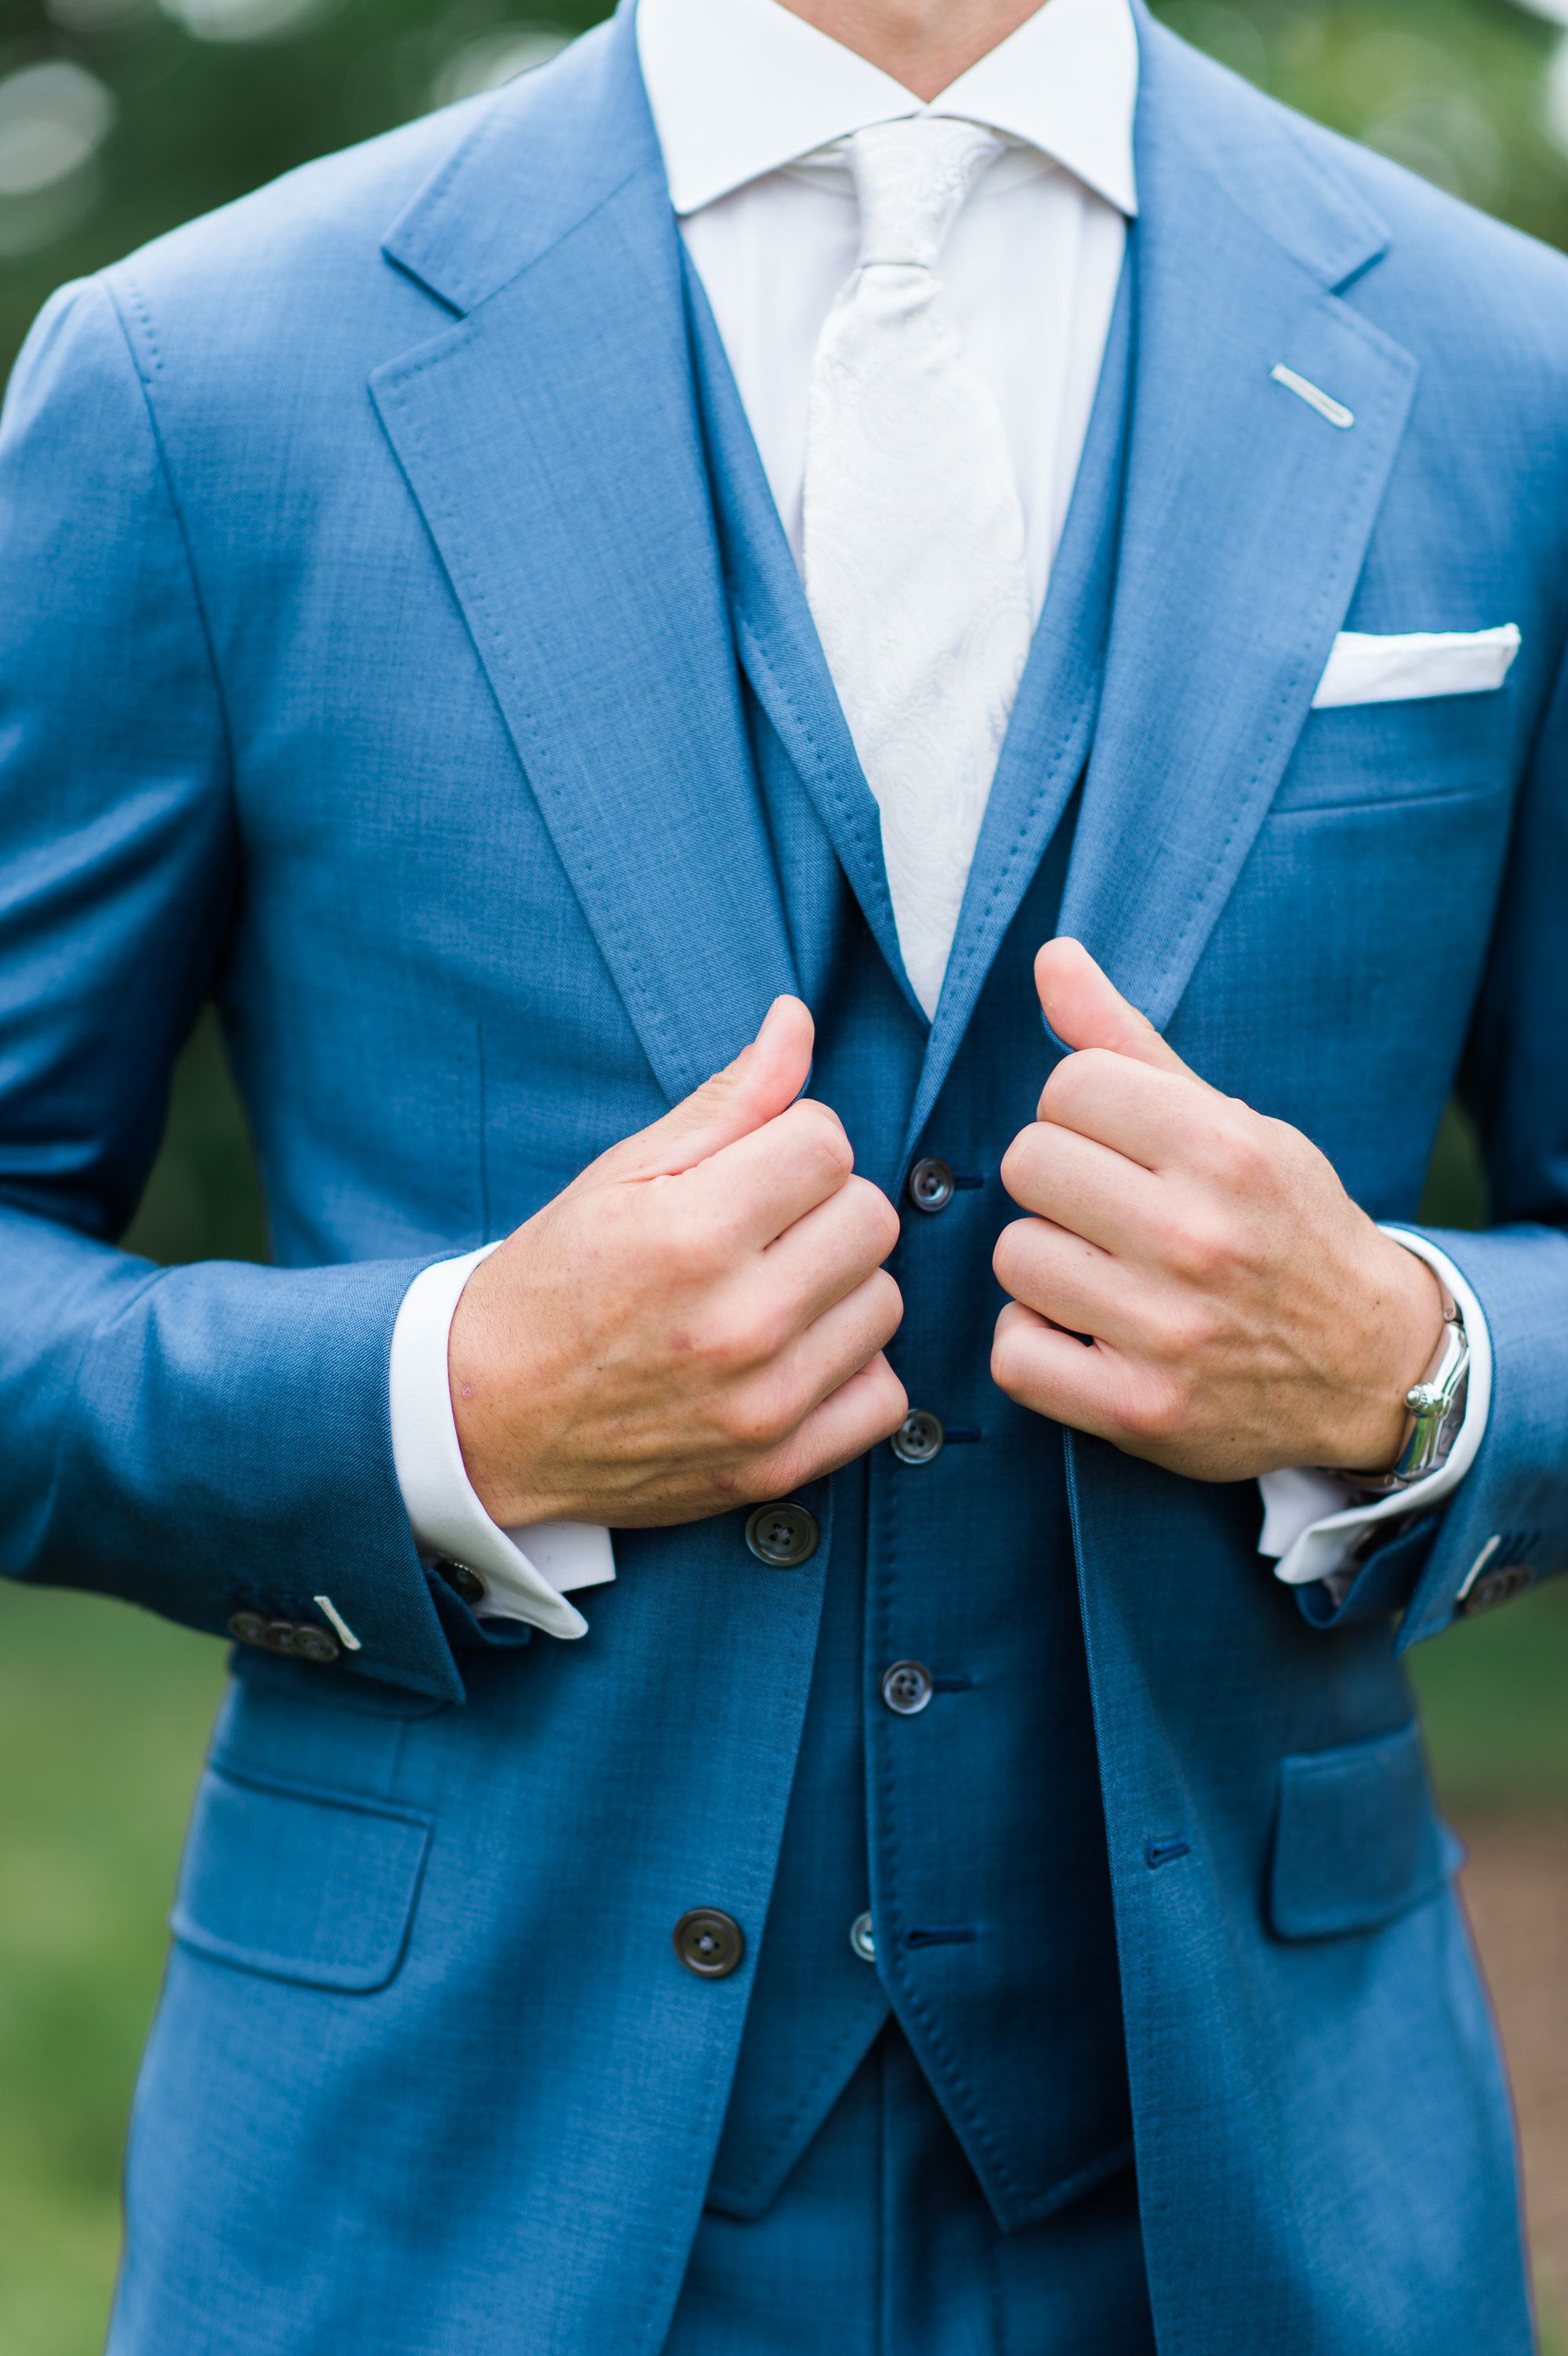 Admiral blue 3 piece sharkskin suit by Daniel George | Tuxedo ...